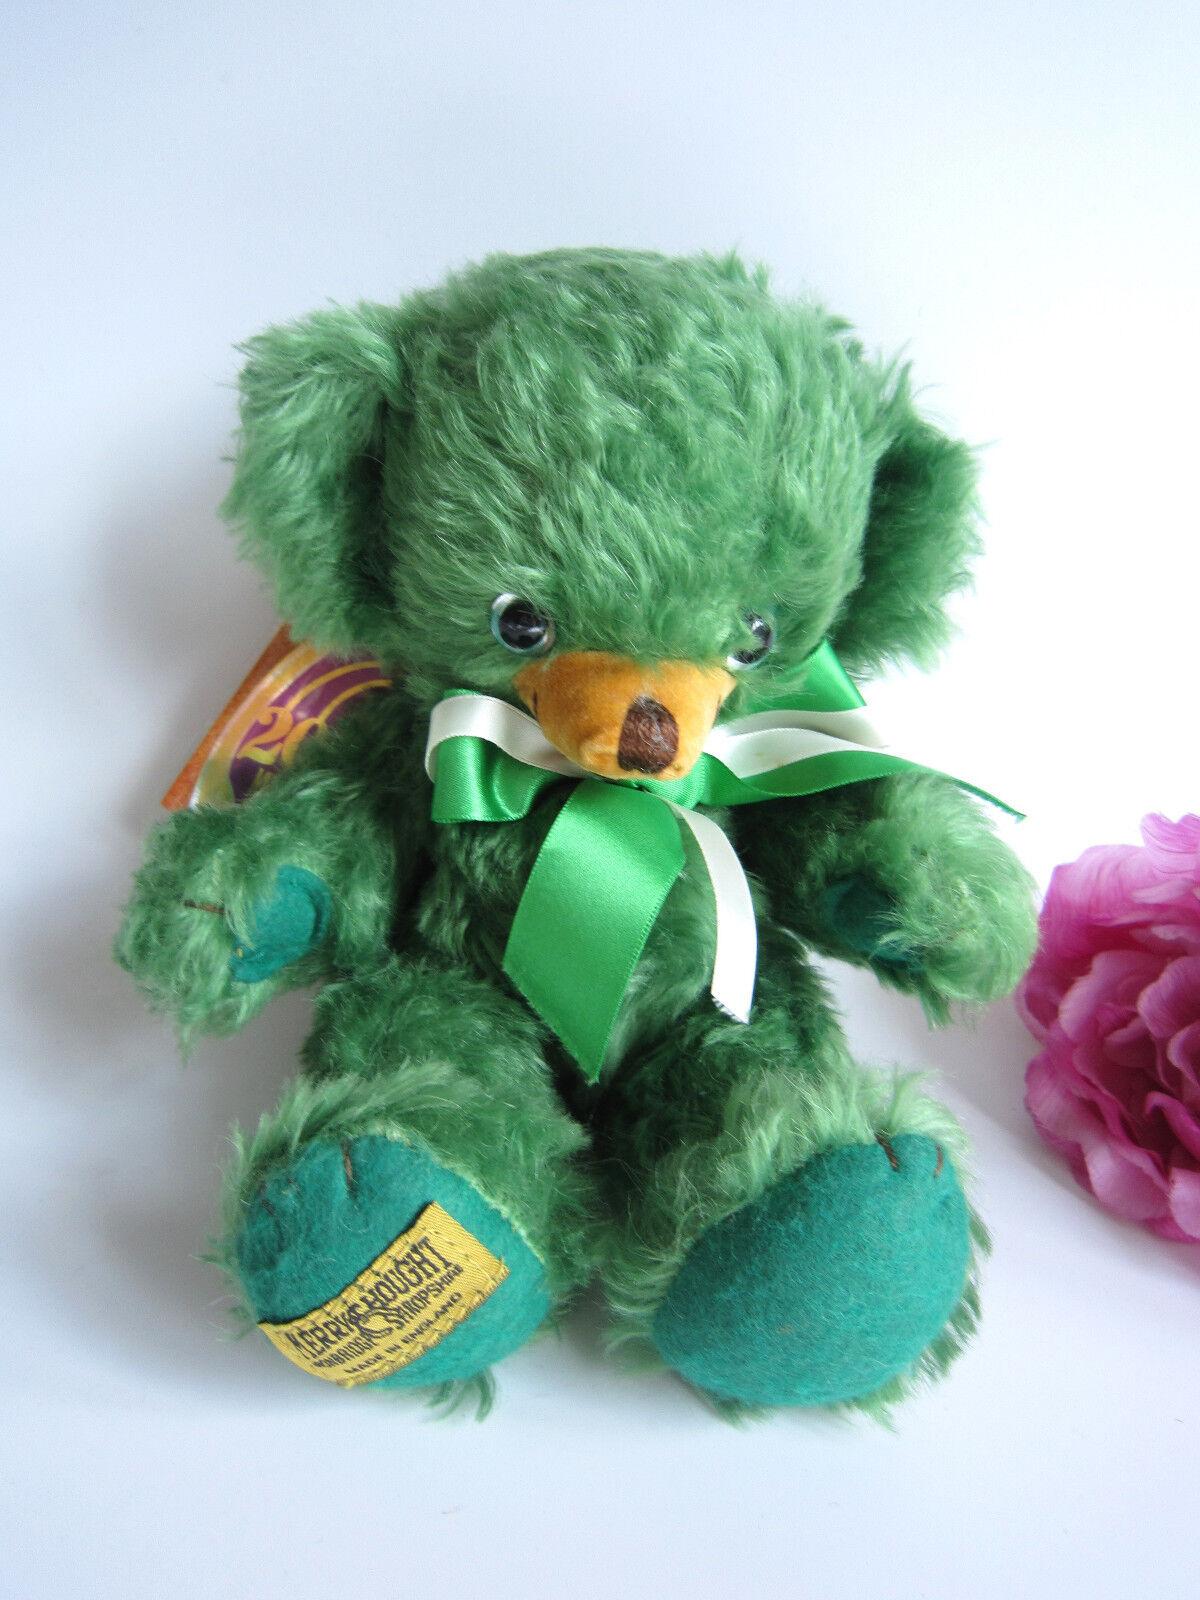 Merrythought verde Bean Cheeky Orso 10 . Ltd. STUPENDO. perfetto.